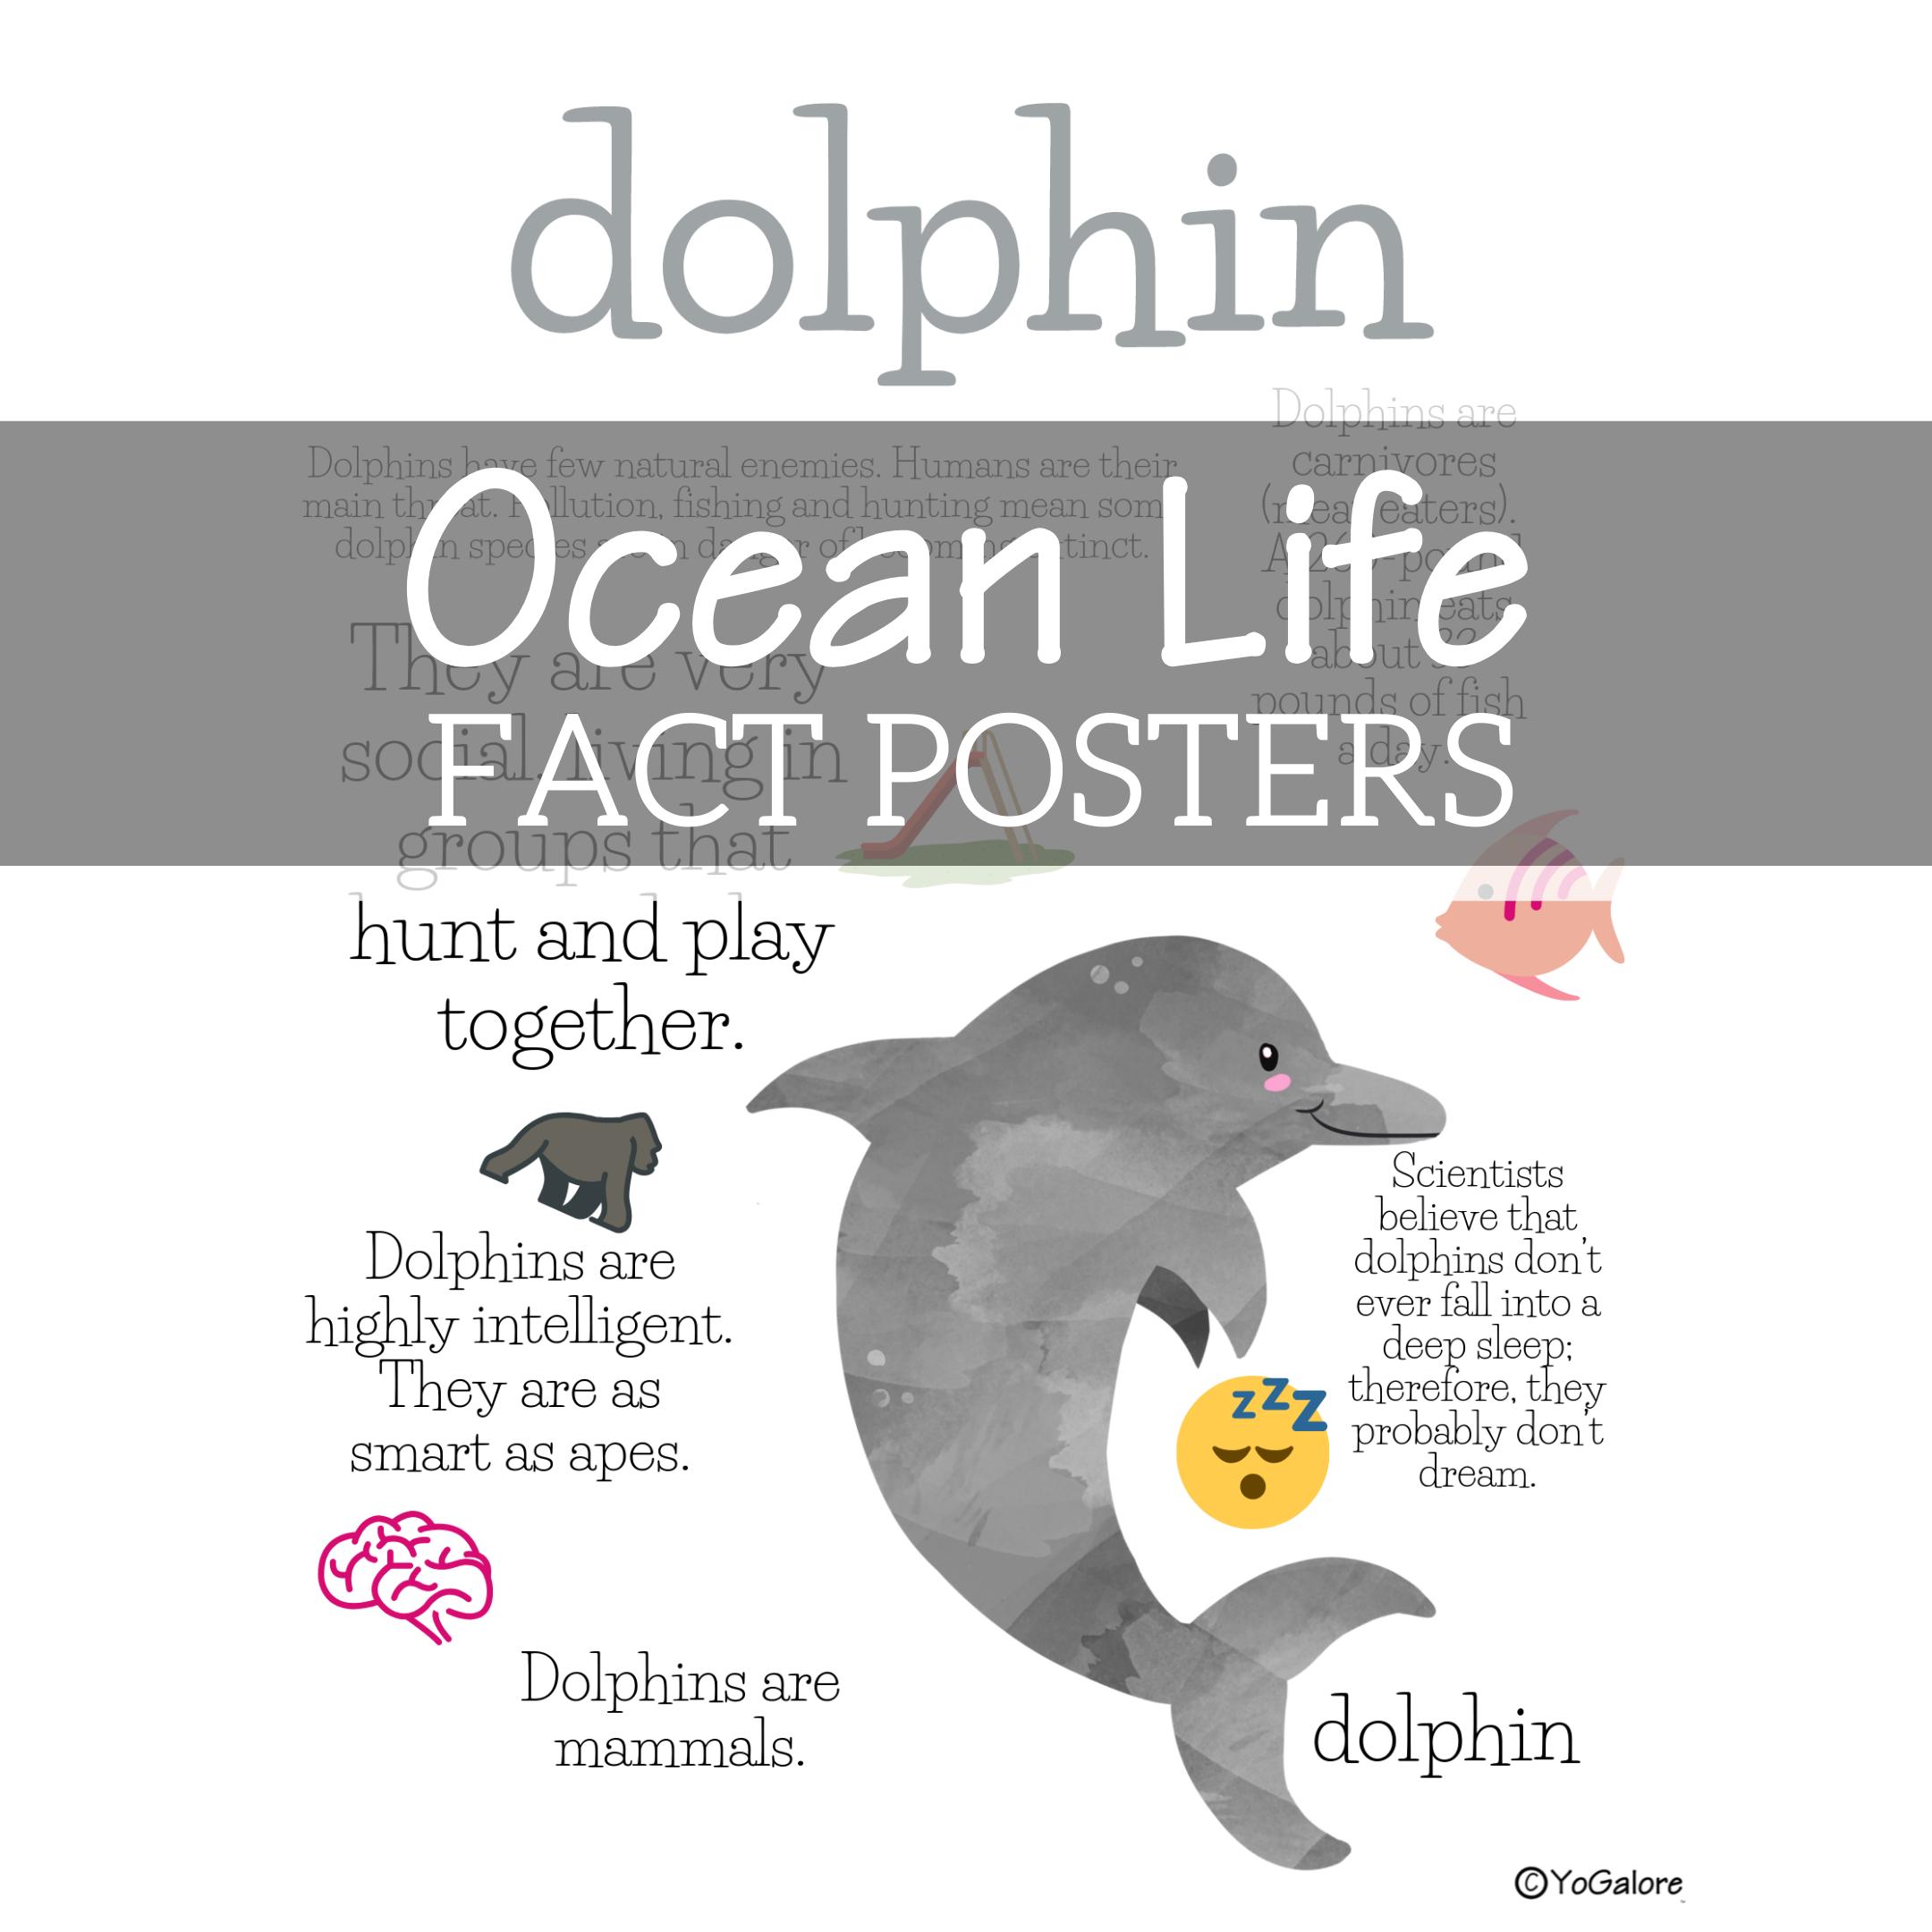 Ocean Life Fact Posters